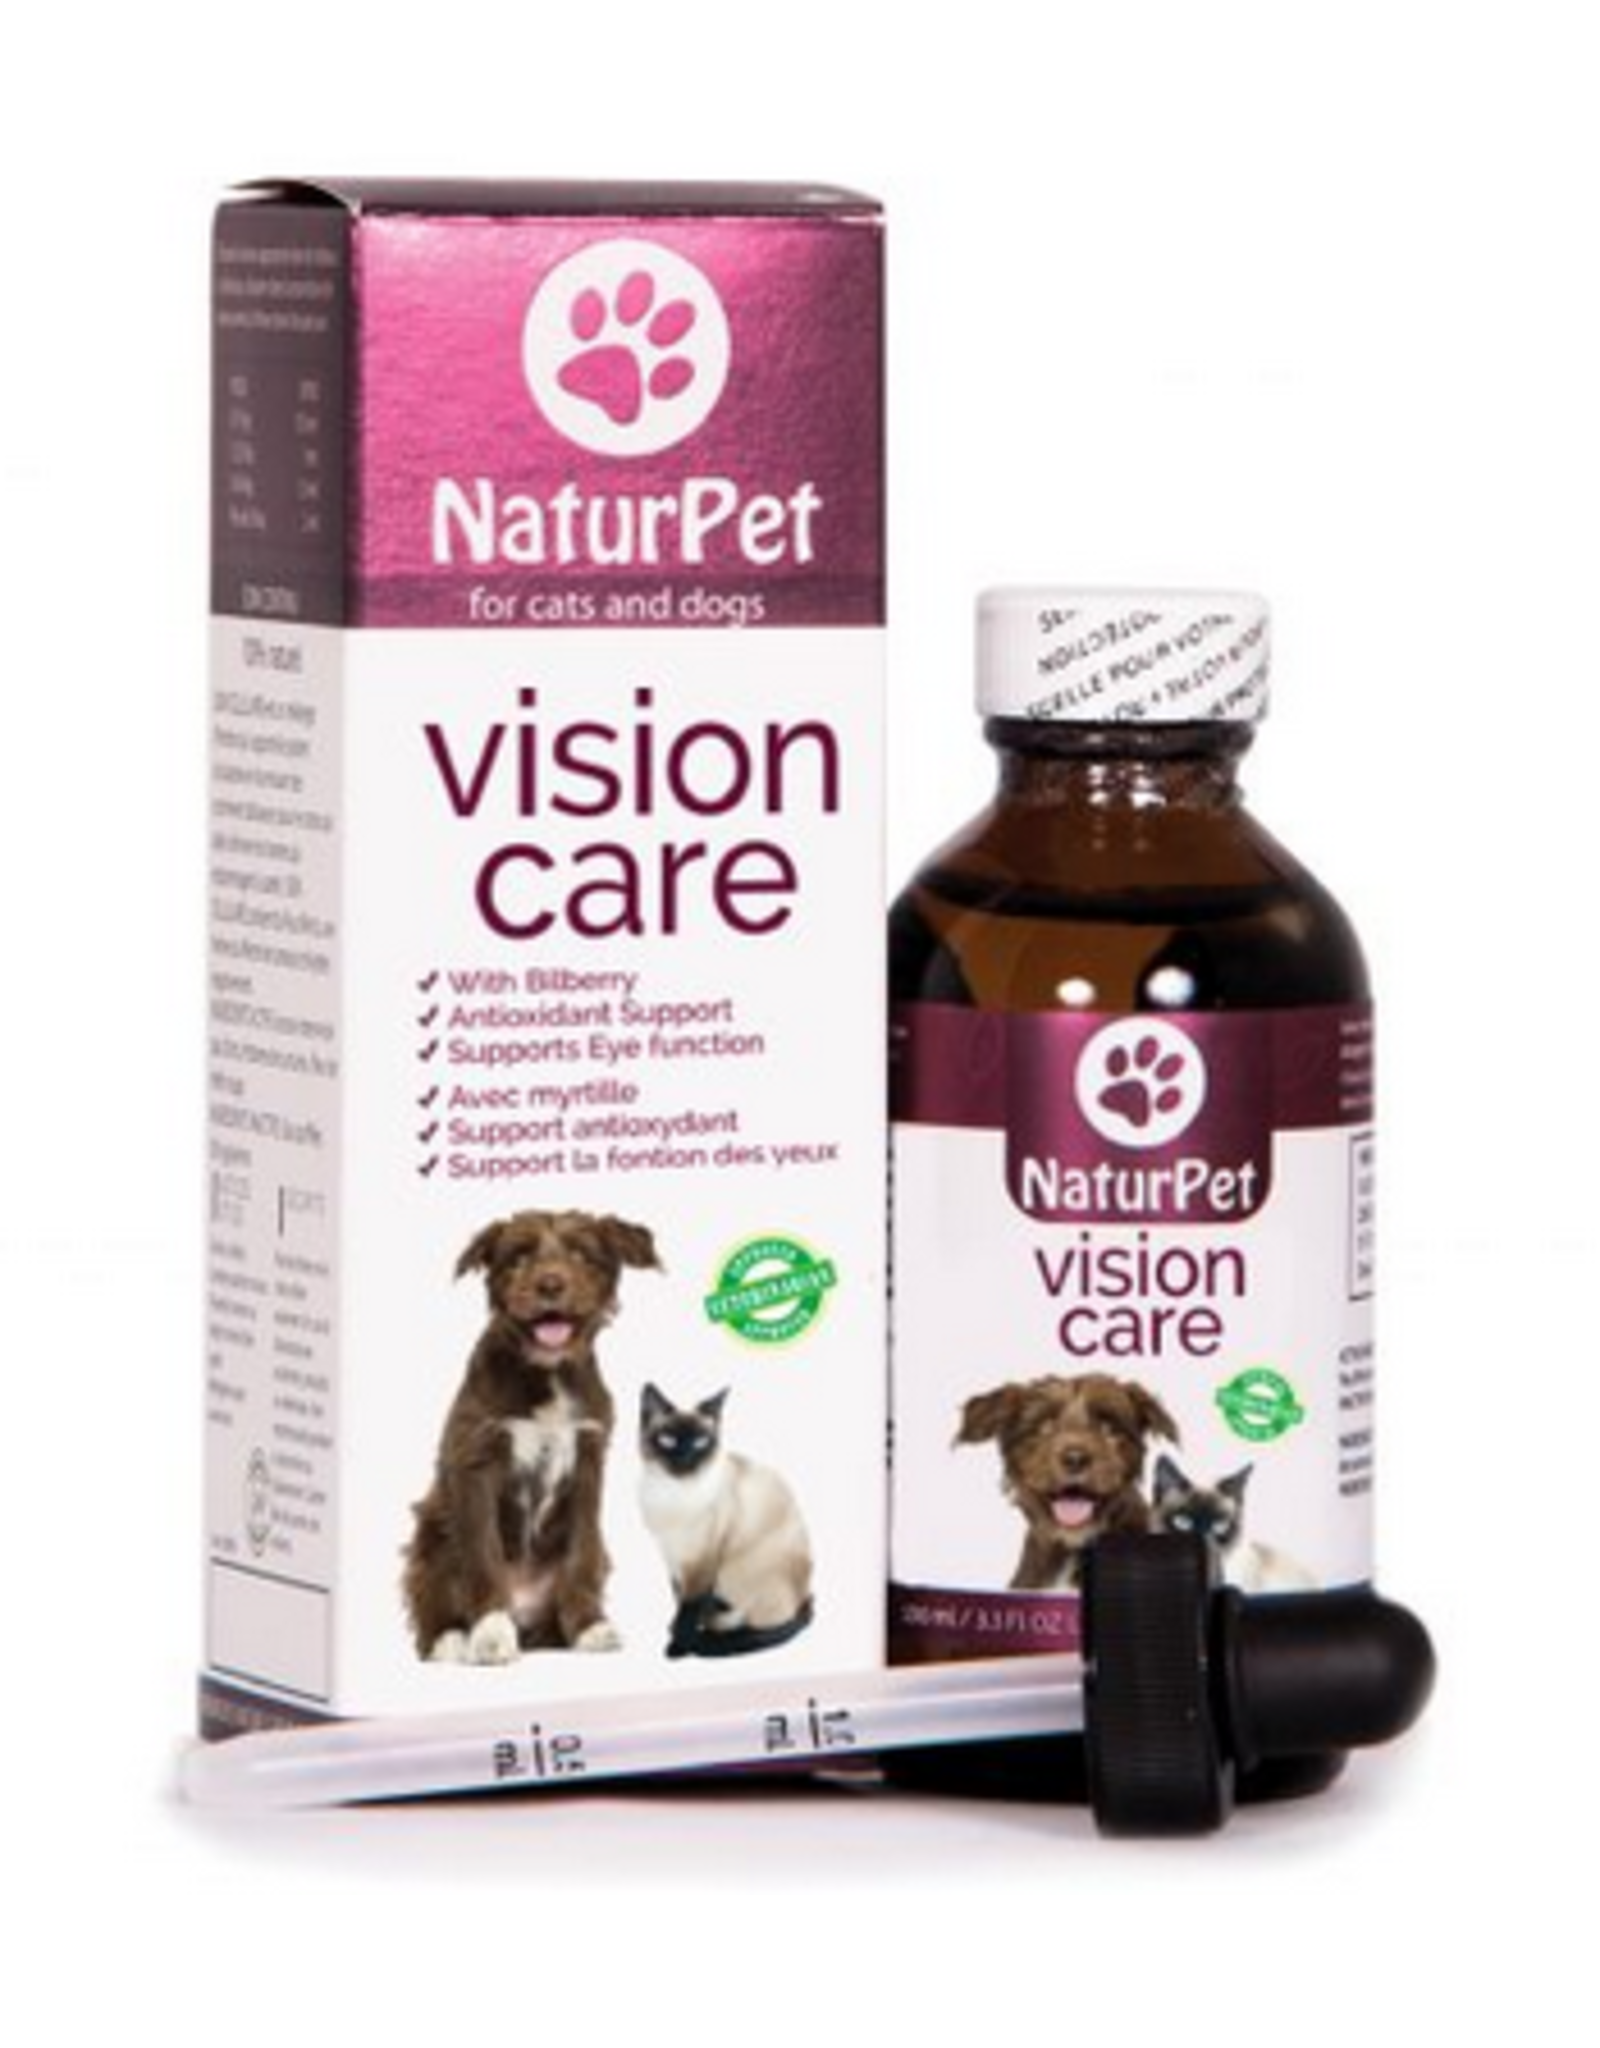 Naturpet Naturpet - Vision care